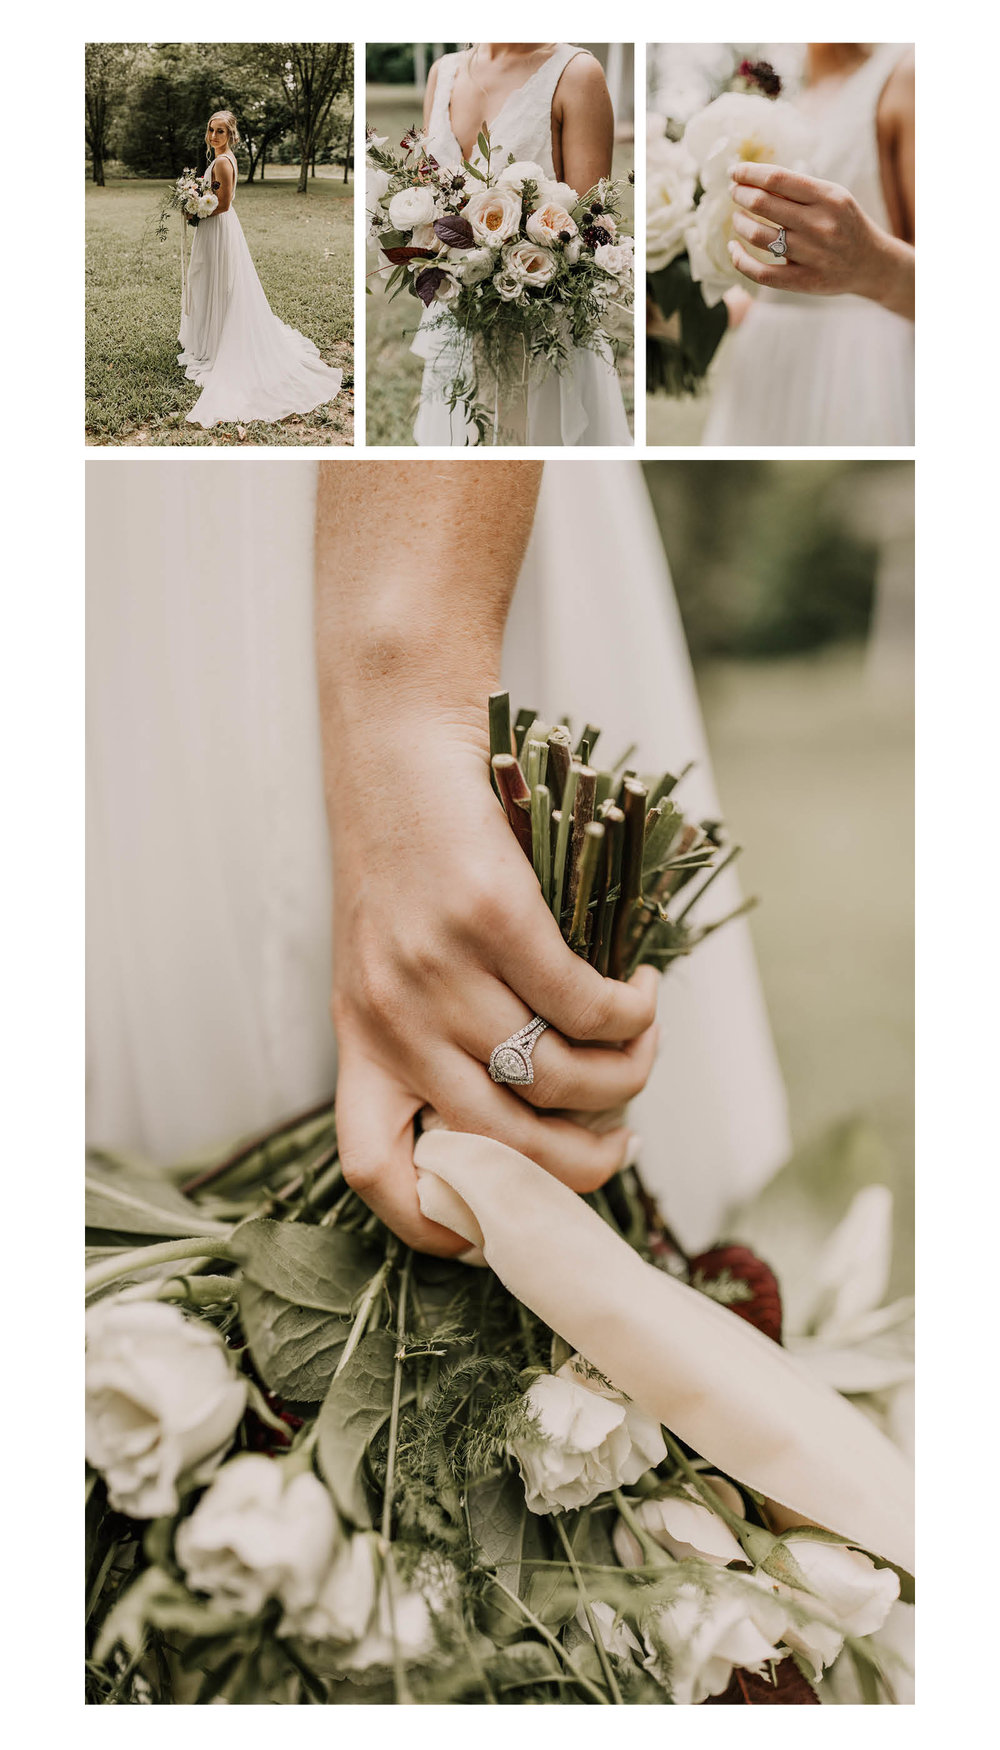 arkansas-wedding-photographer-sarandy-westfall